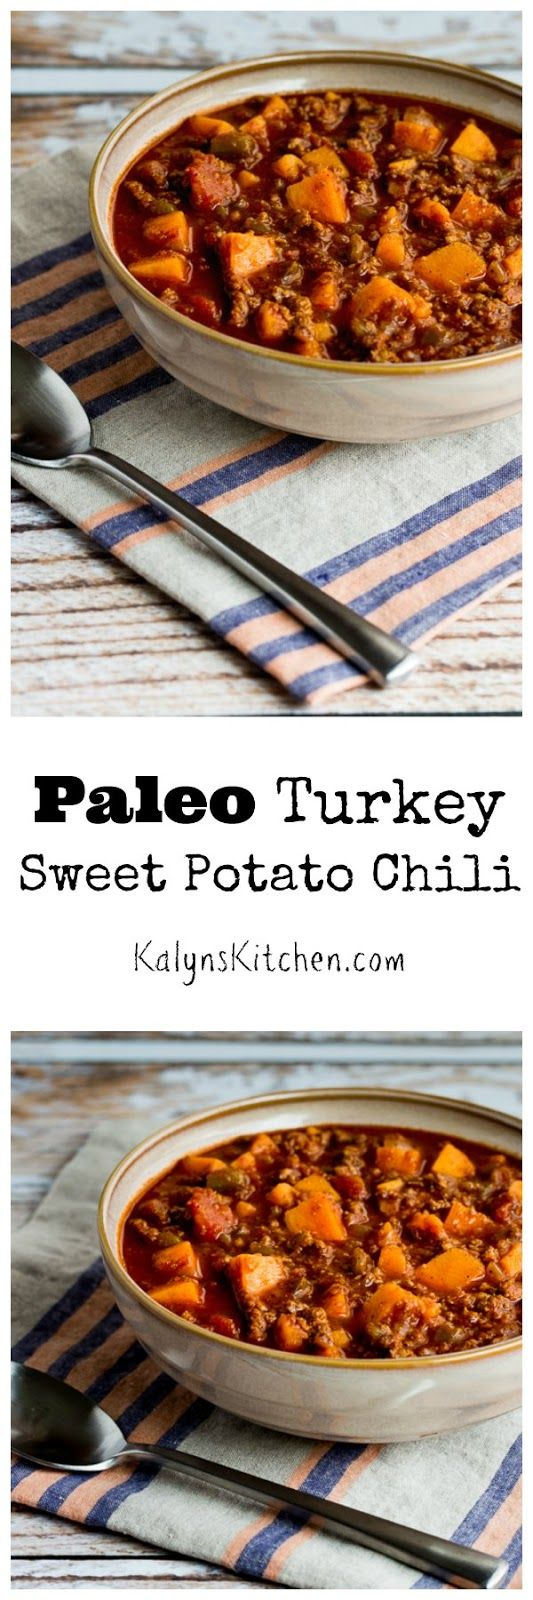 Paleo Turkey Sweet Potato Chili is also gluten-free and dairy-free. If you like savory sweet potato recipes like I do, you'll love this chili. [found on KalynsKitchen.com]